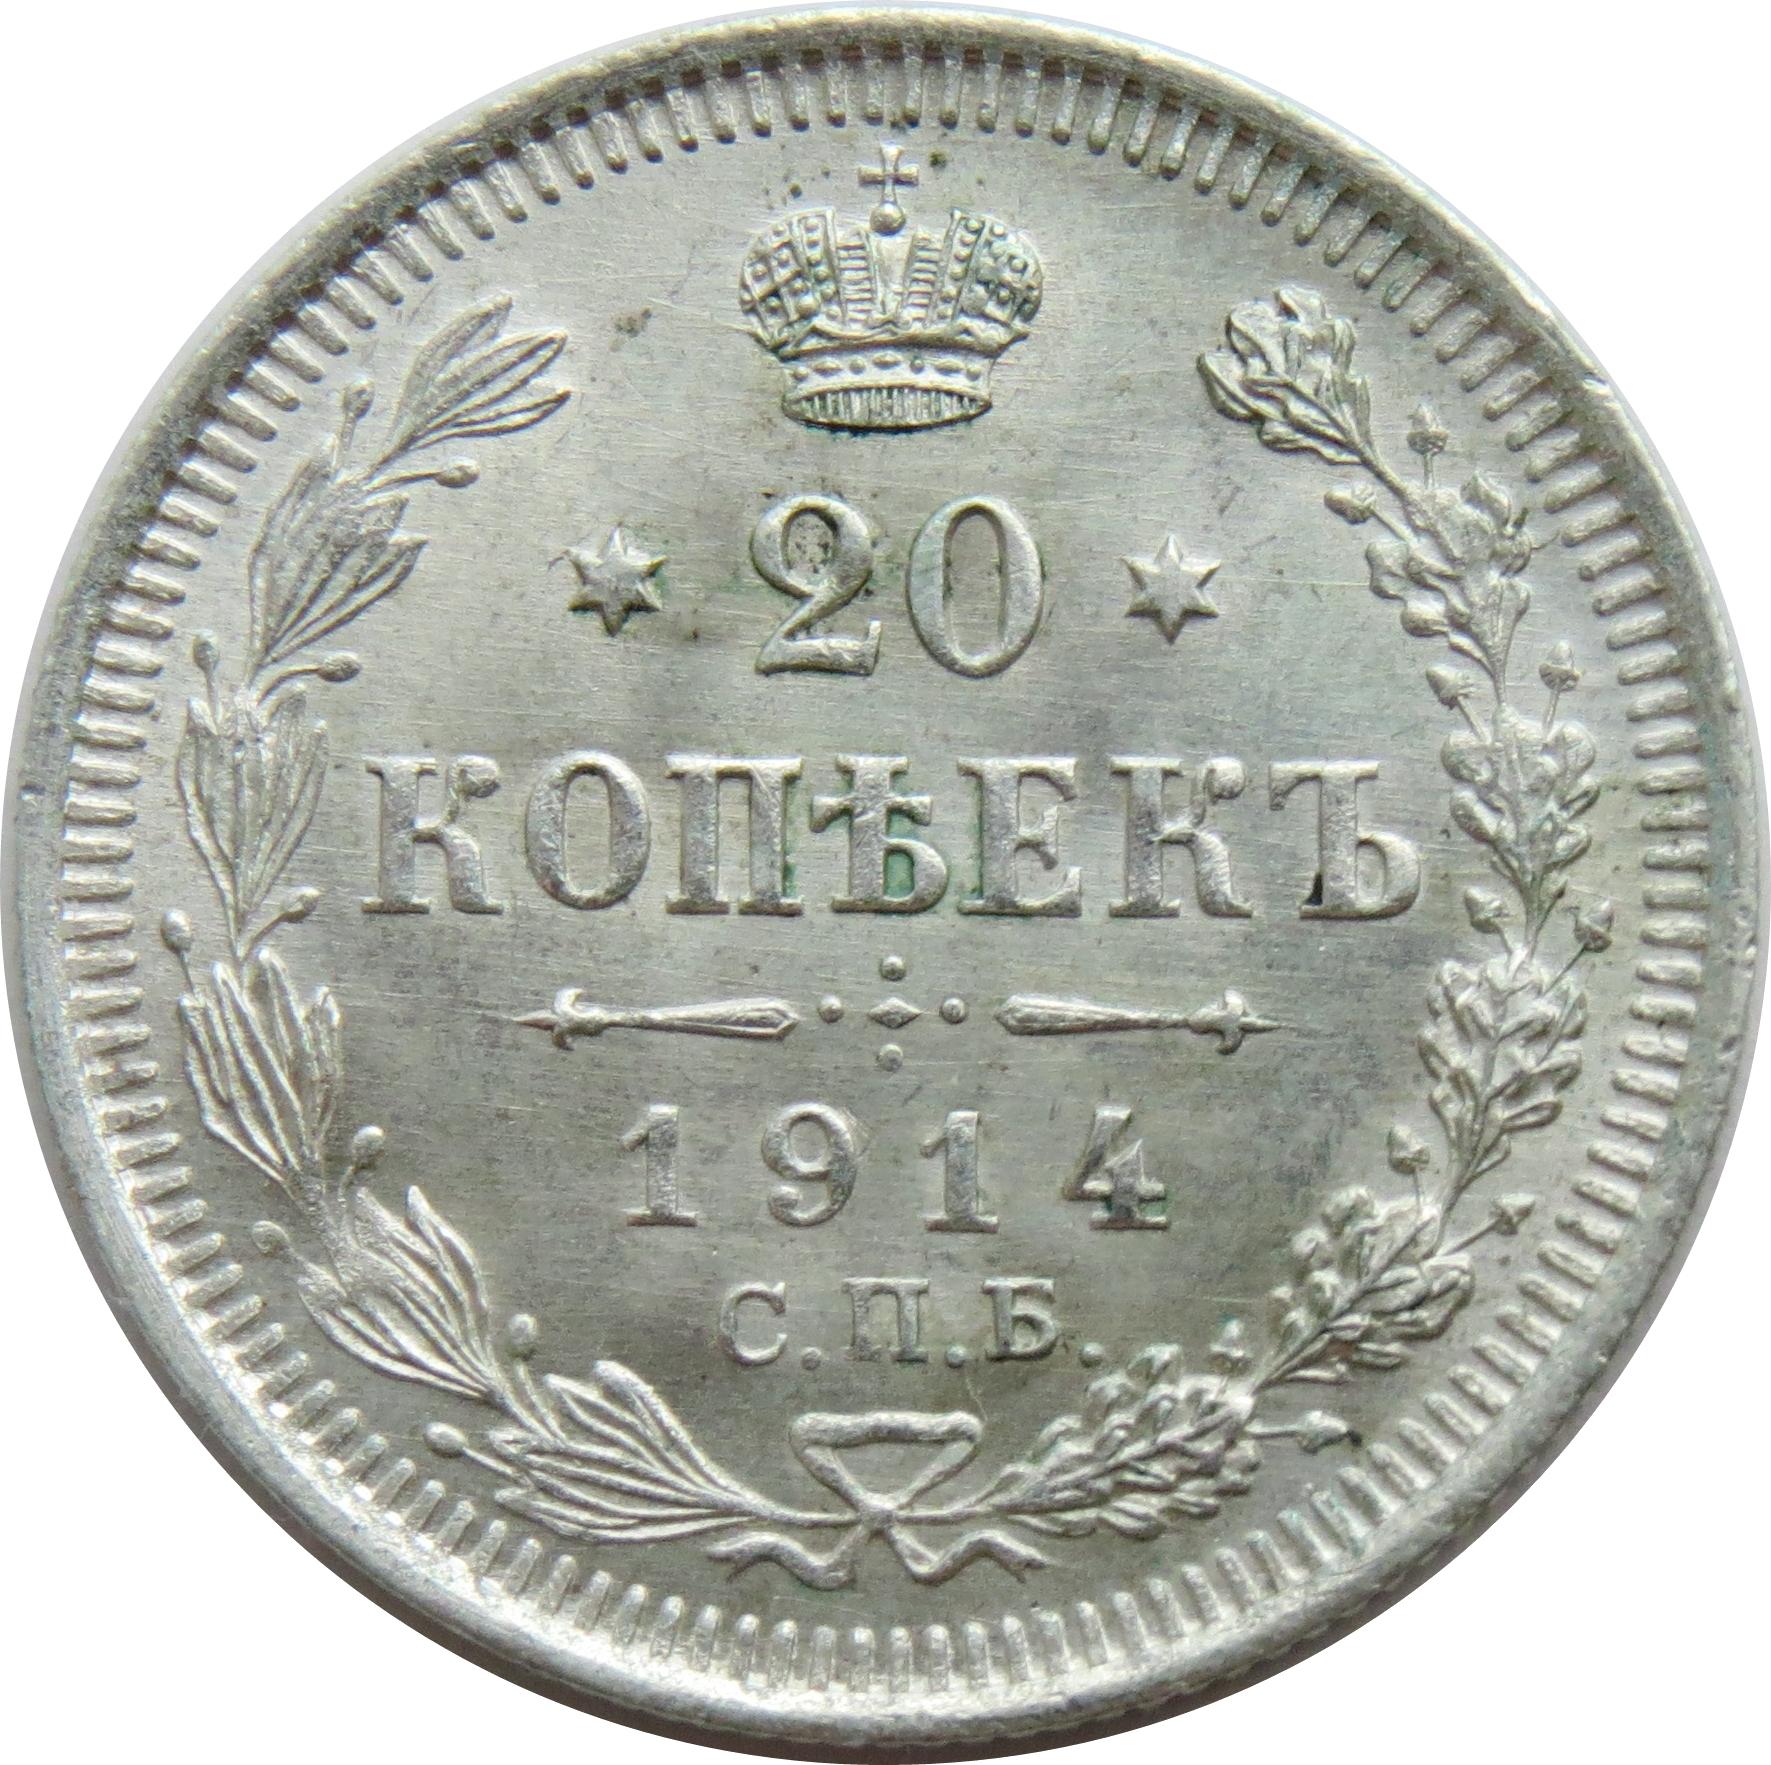 1889 YEAR 5 KOPEIKA RUSSIA SILVER COIN